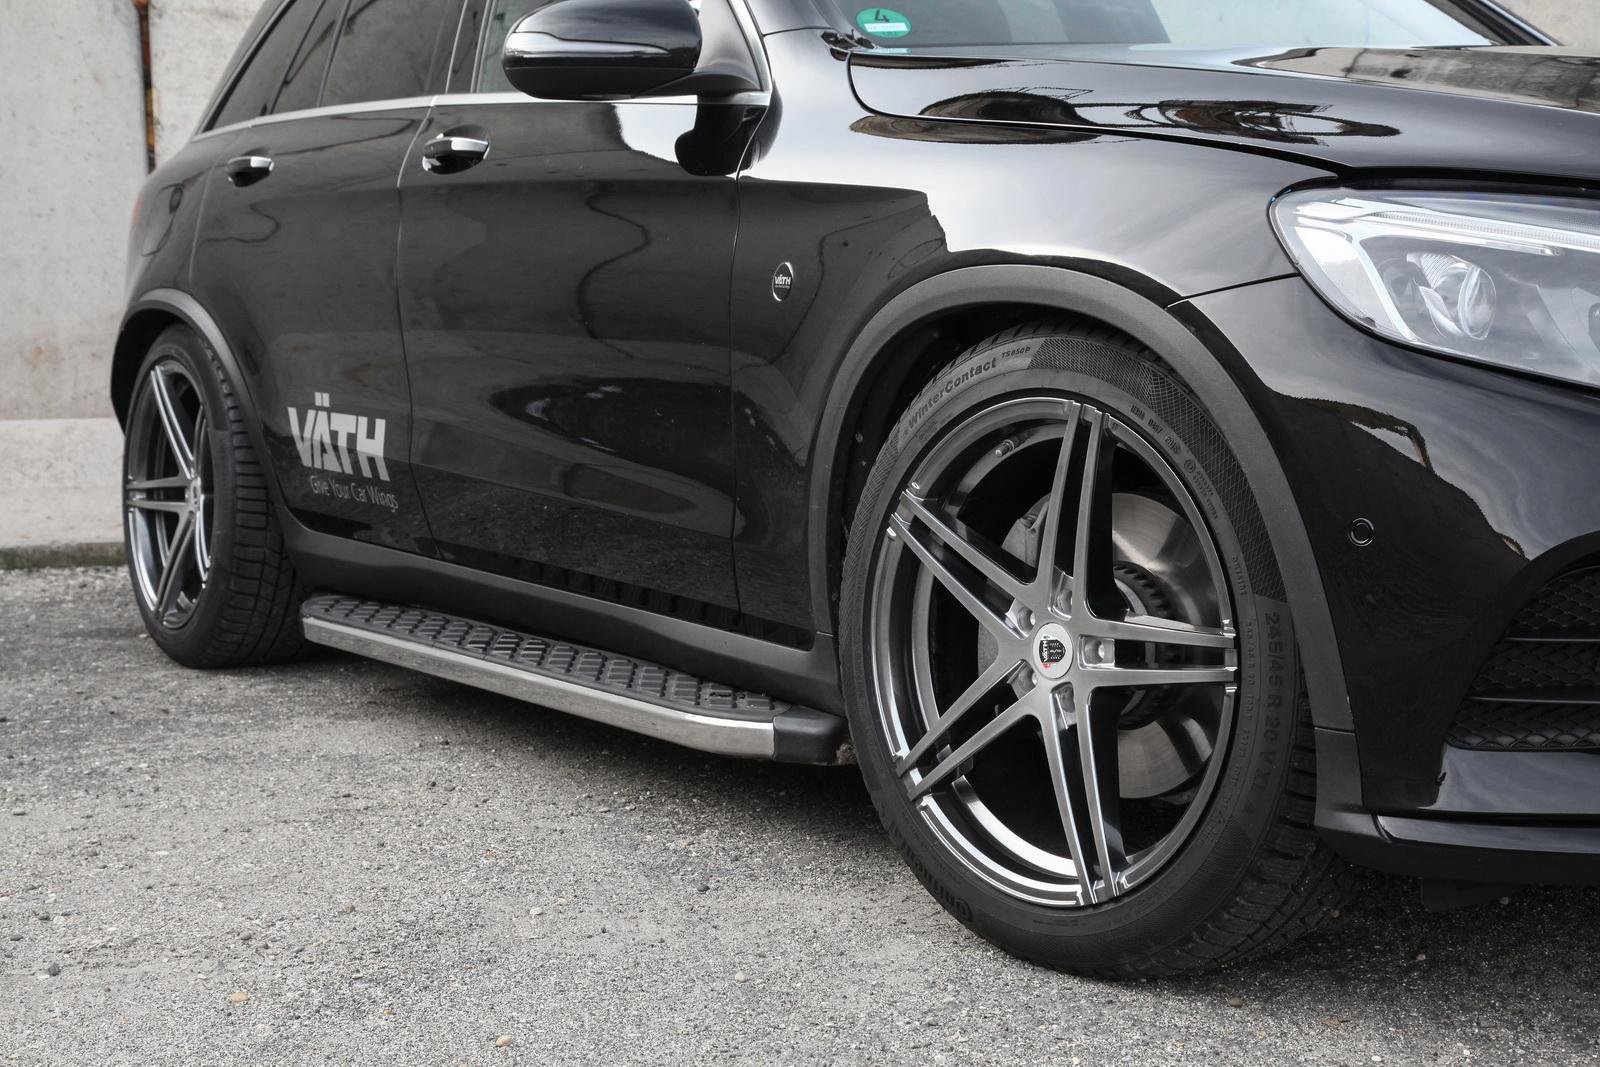 Mercedes_GLC220d_by_Vath_20